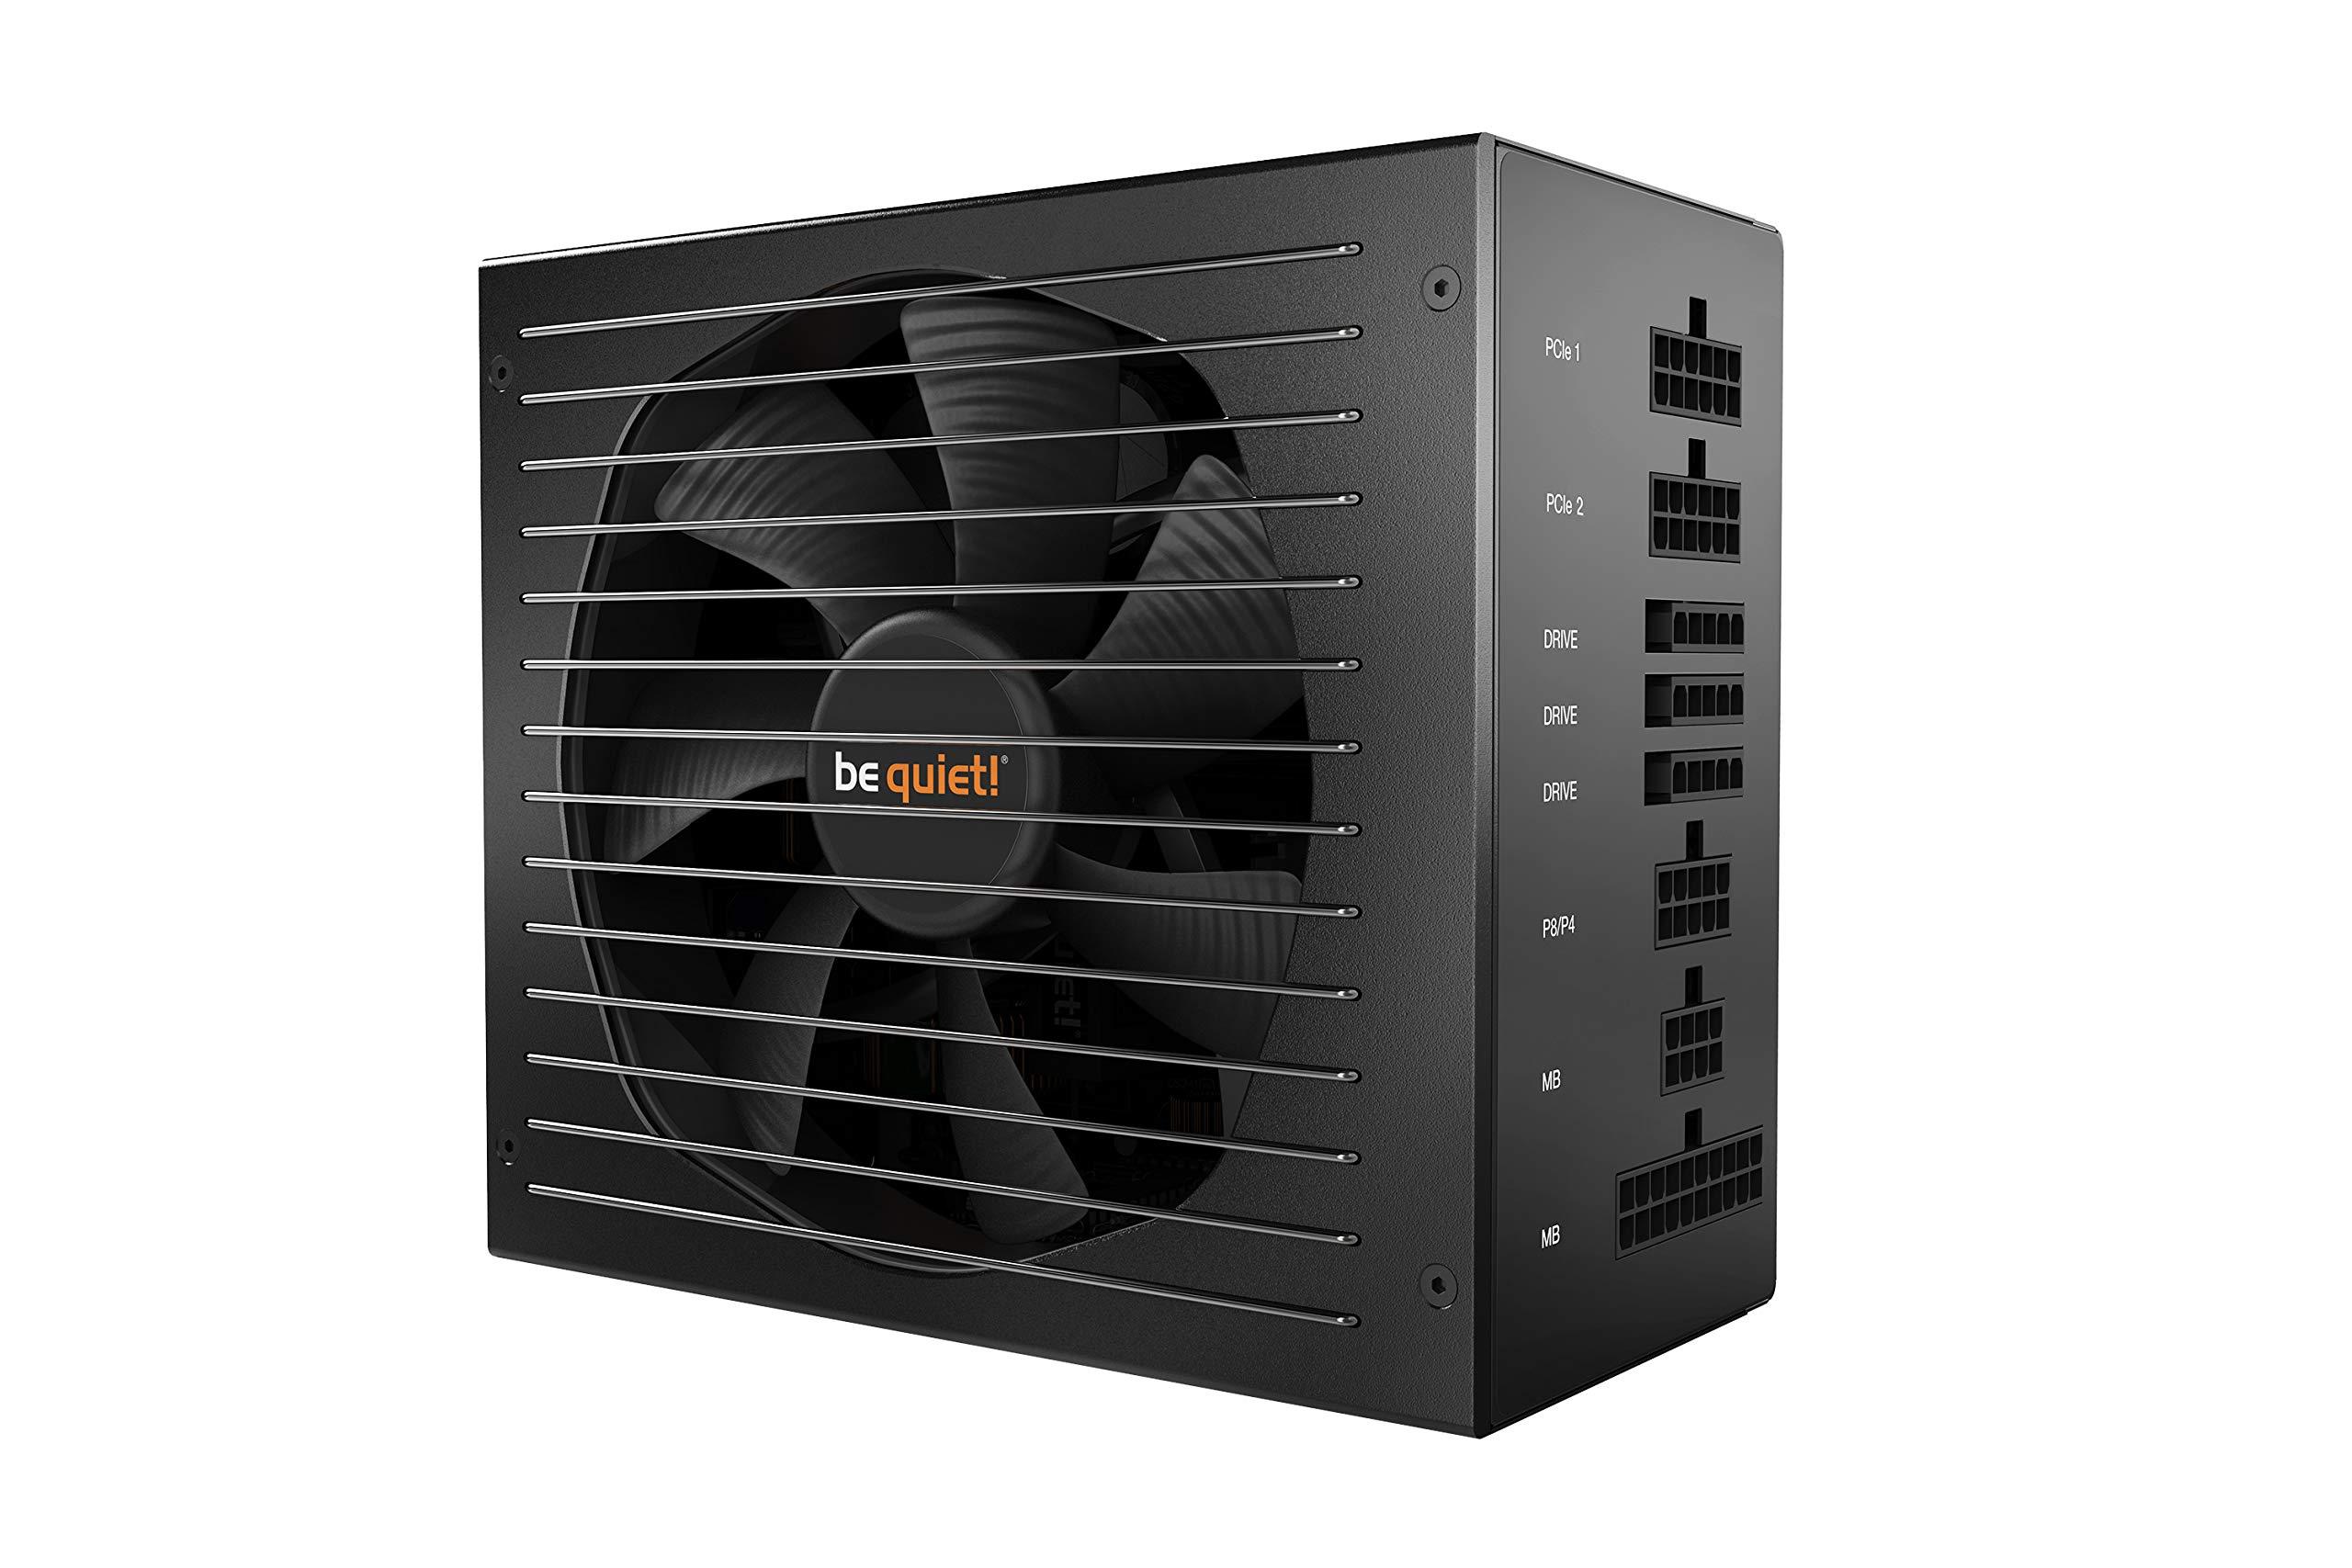 be quiet! Straight Power 11 Platinum 750W, BN642, Fully Modular, Power Supply